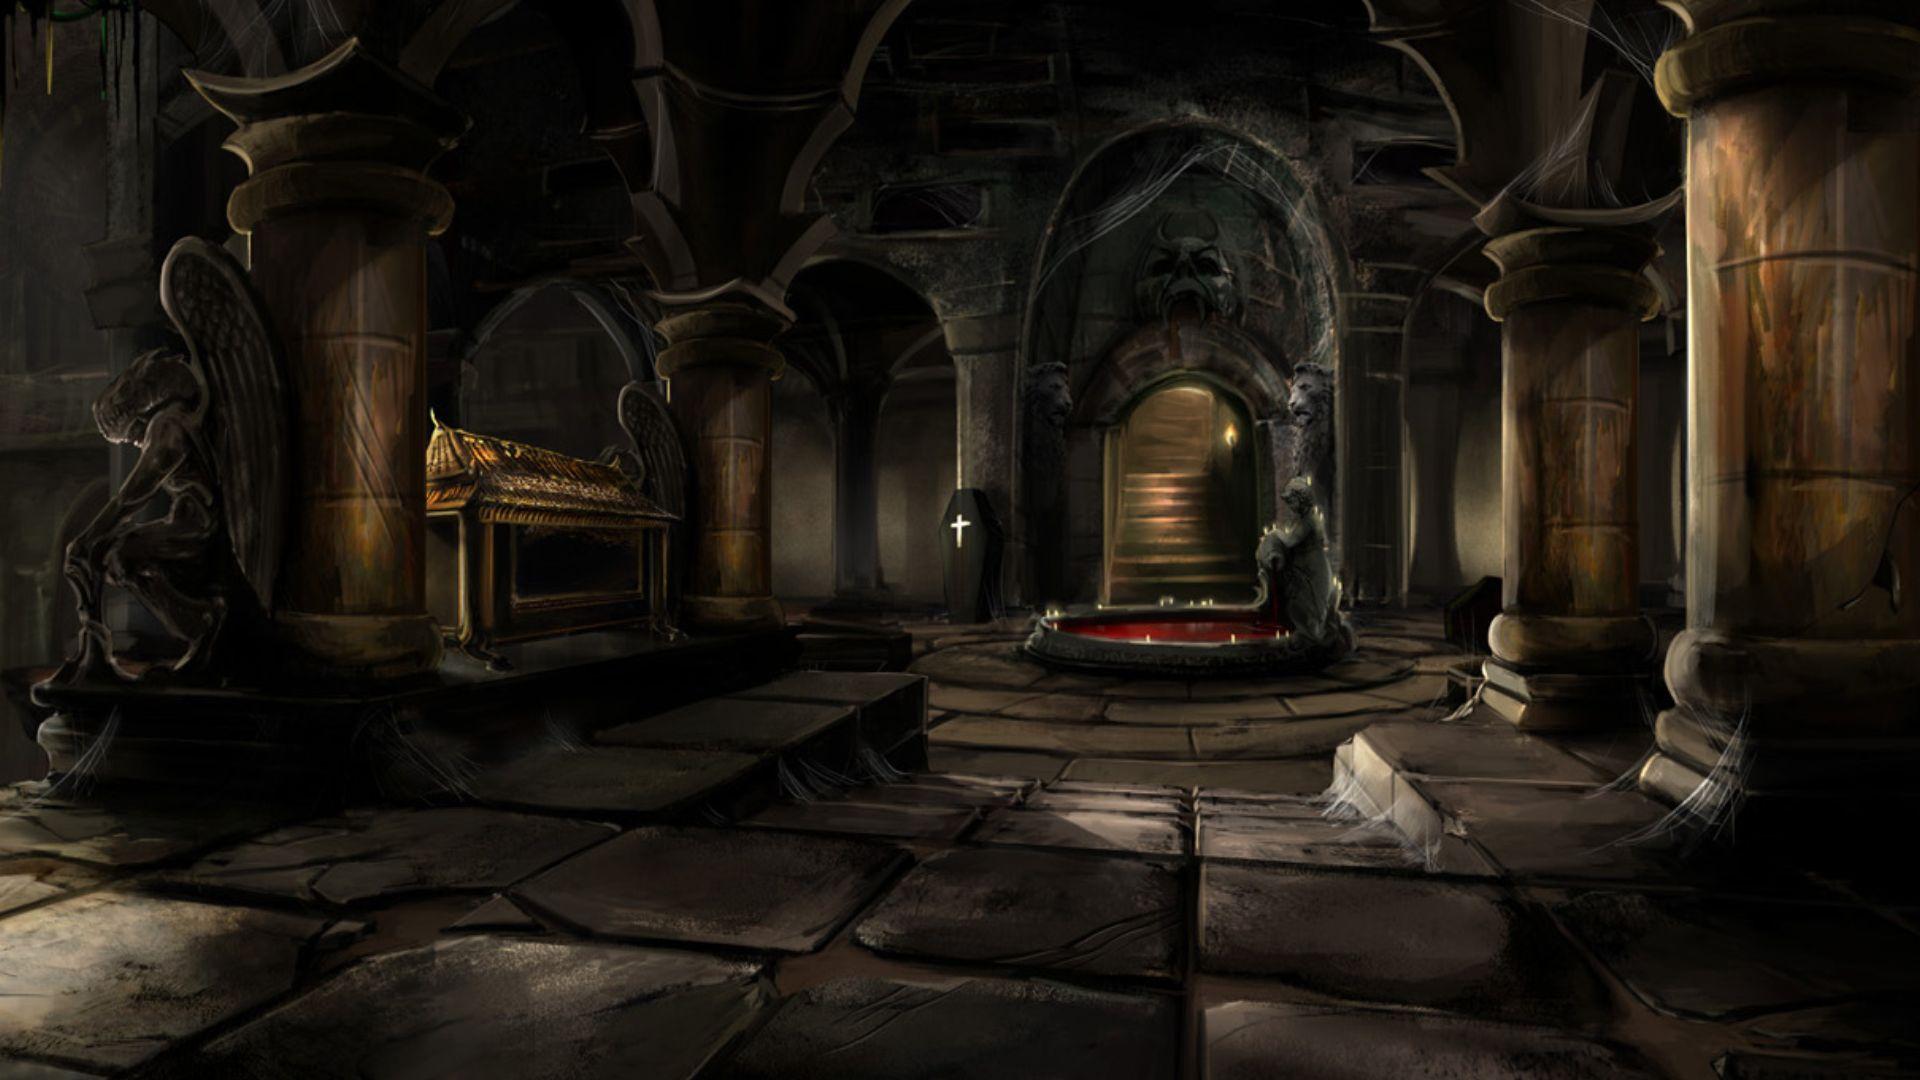 haunted catacombsjpg - Multi Castle Interior